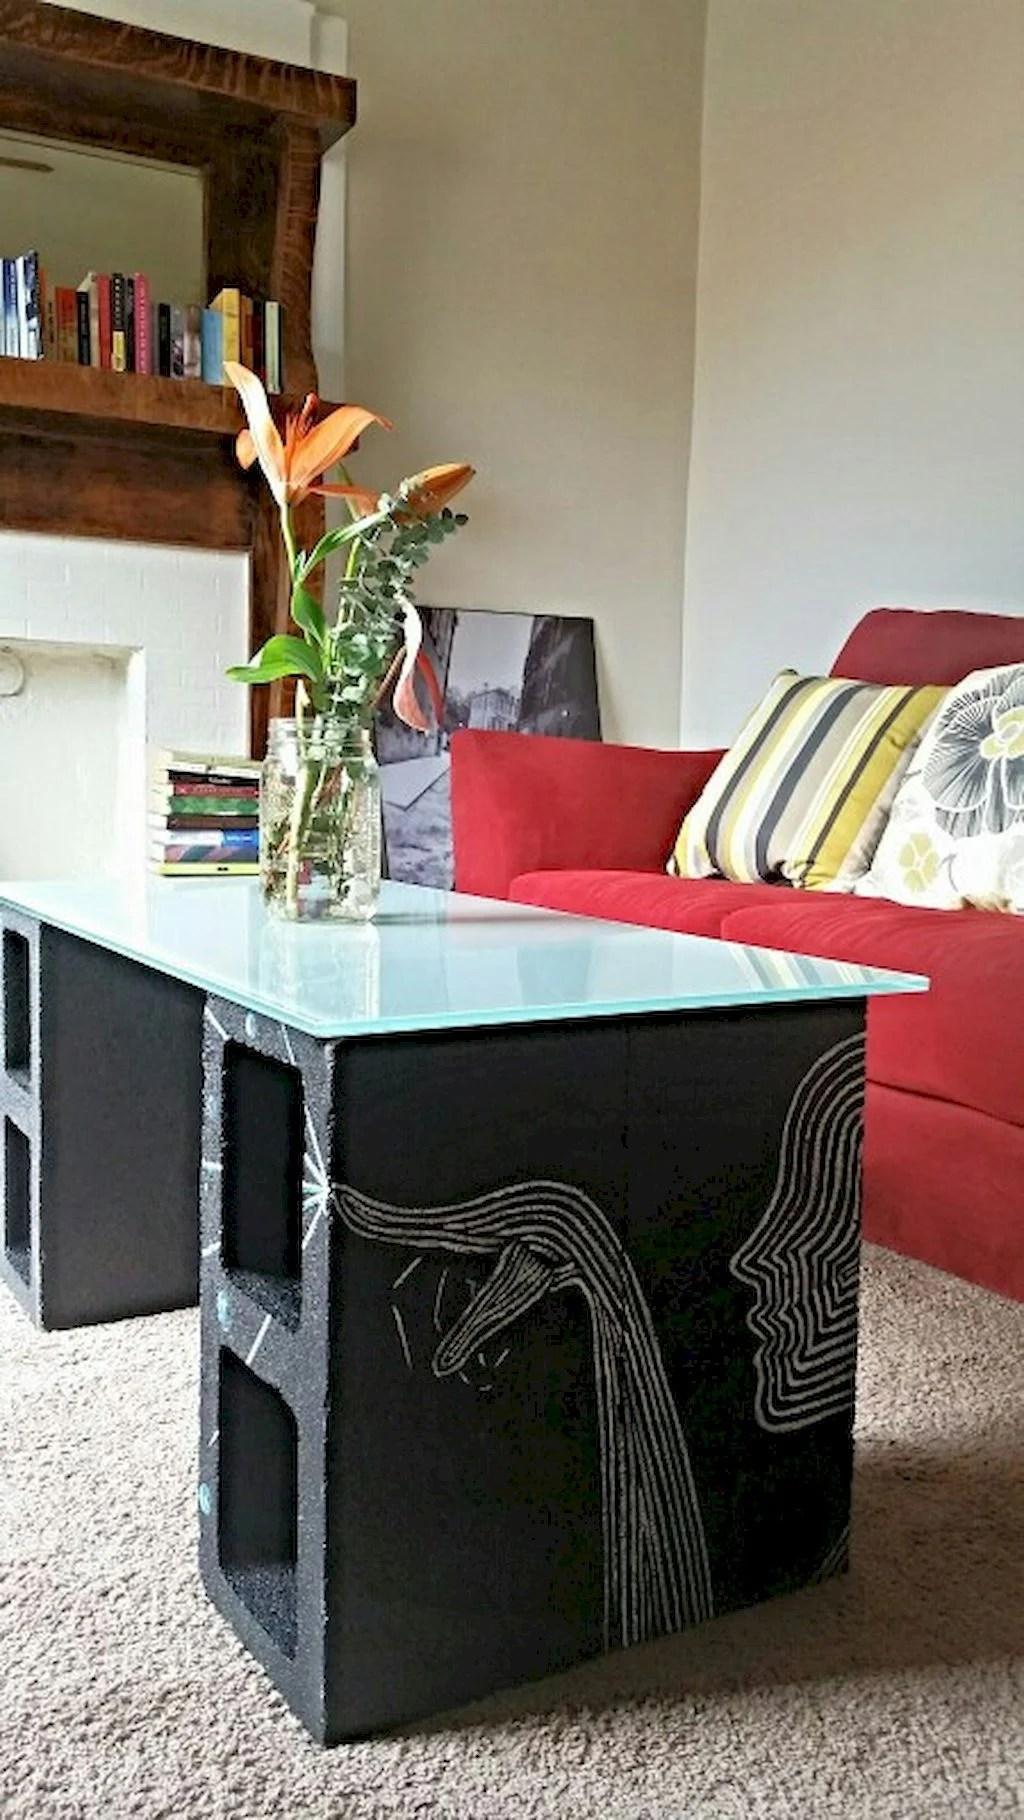 15 Ideas para decorar tu casa usando bloques de cemento